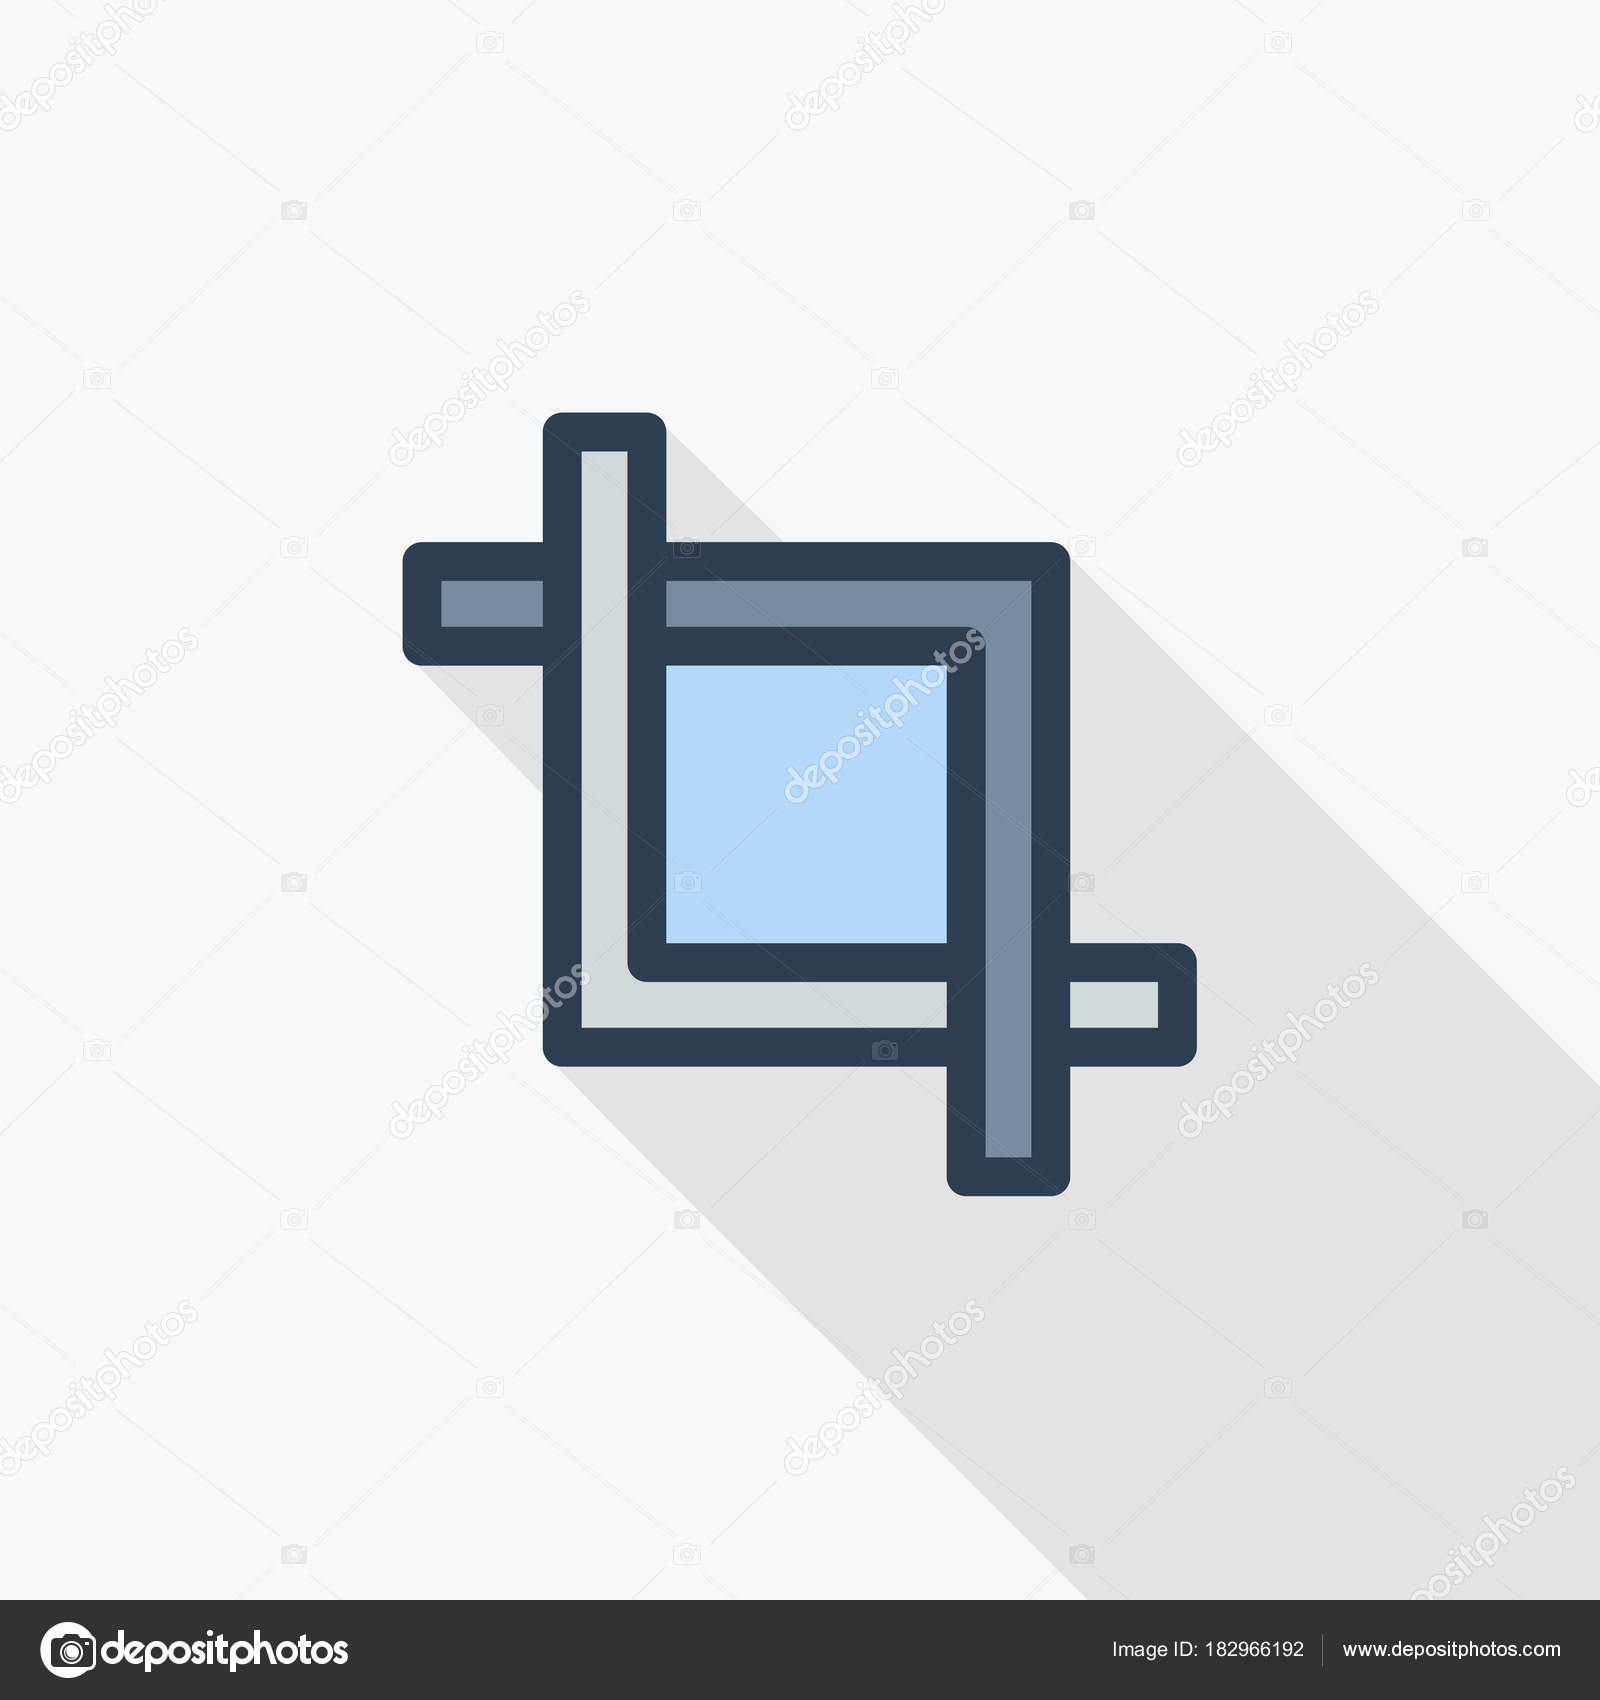 marco de corte icono — Vector de stock © r.Hilch #182966192